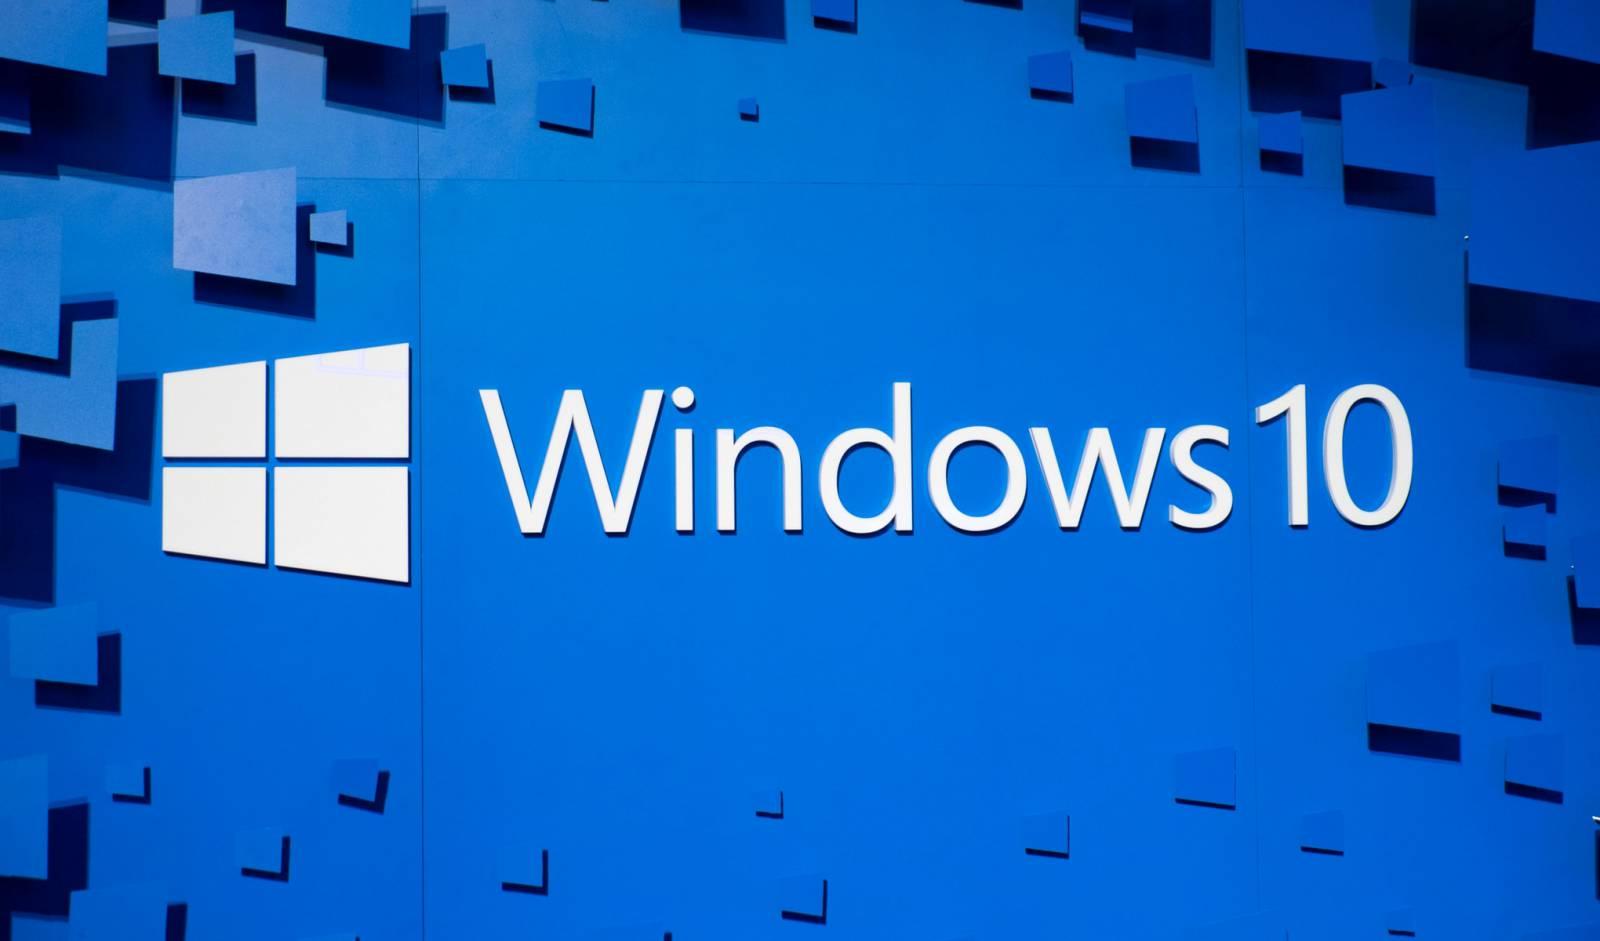 Windows 10 bing chrome